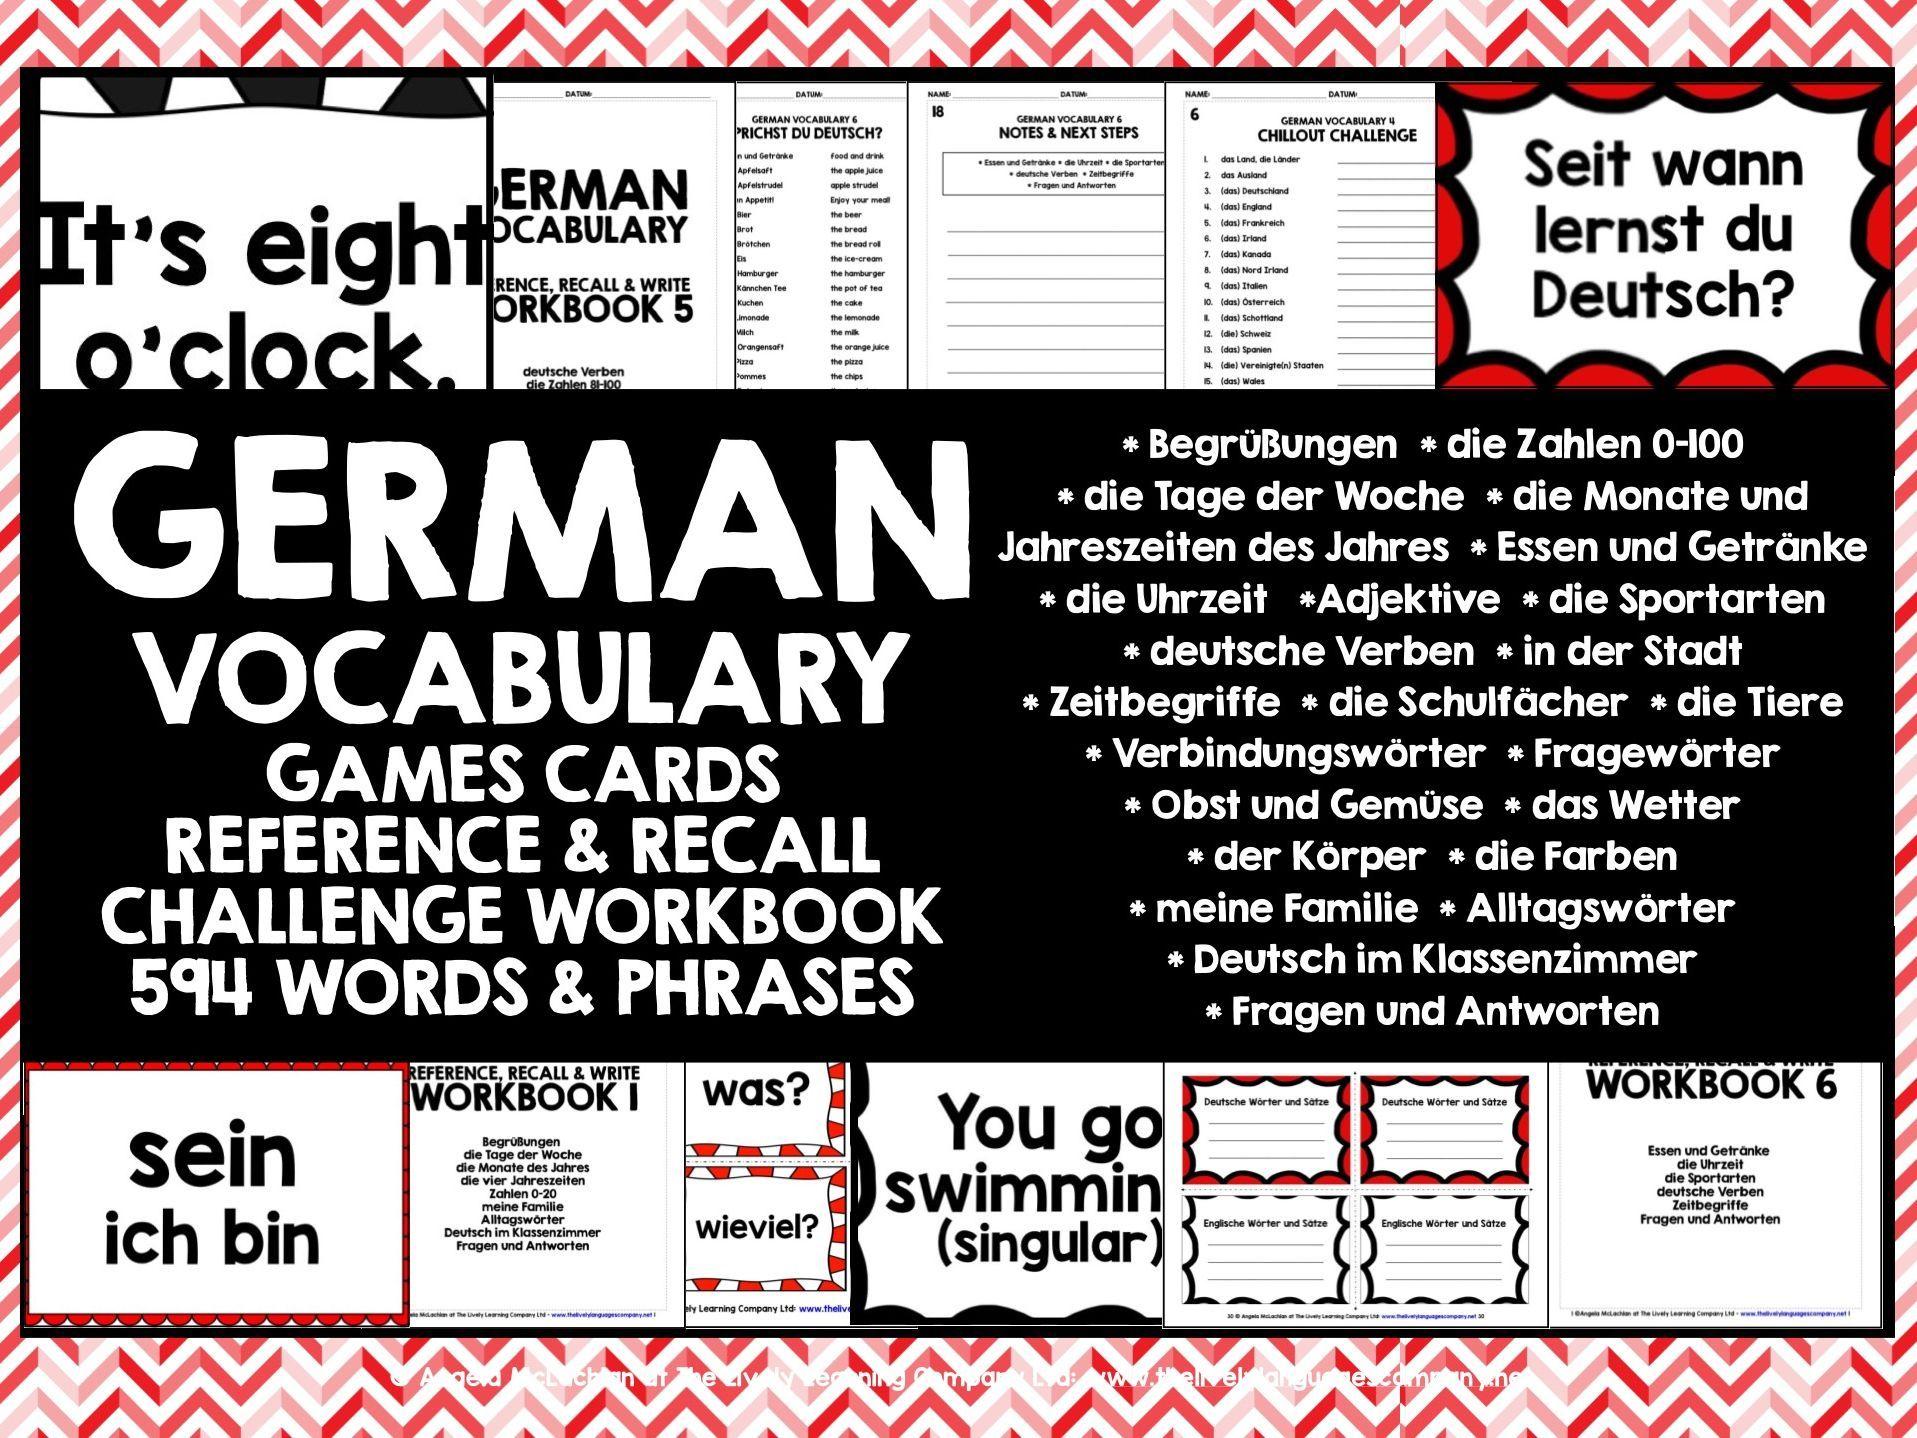 German Vocabulary Cards 2 German Germanvocabulary With